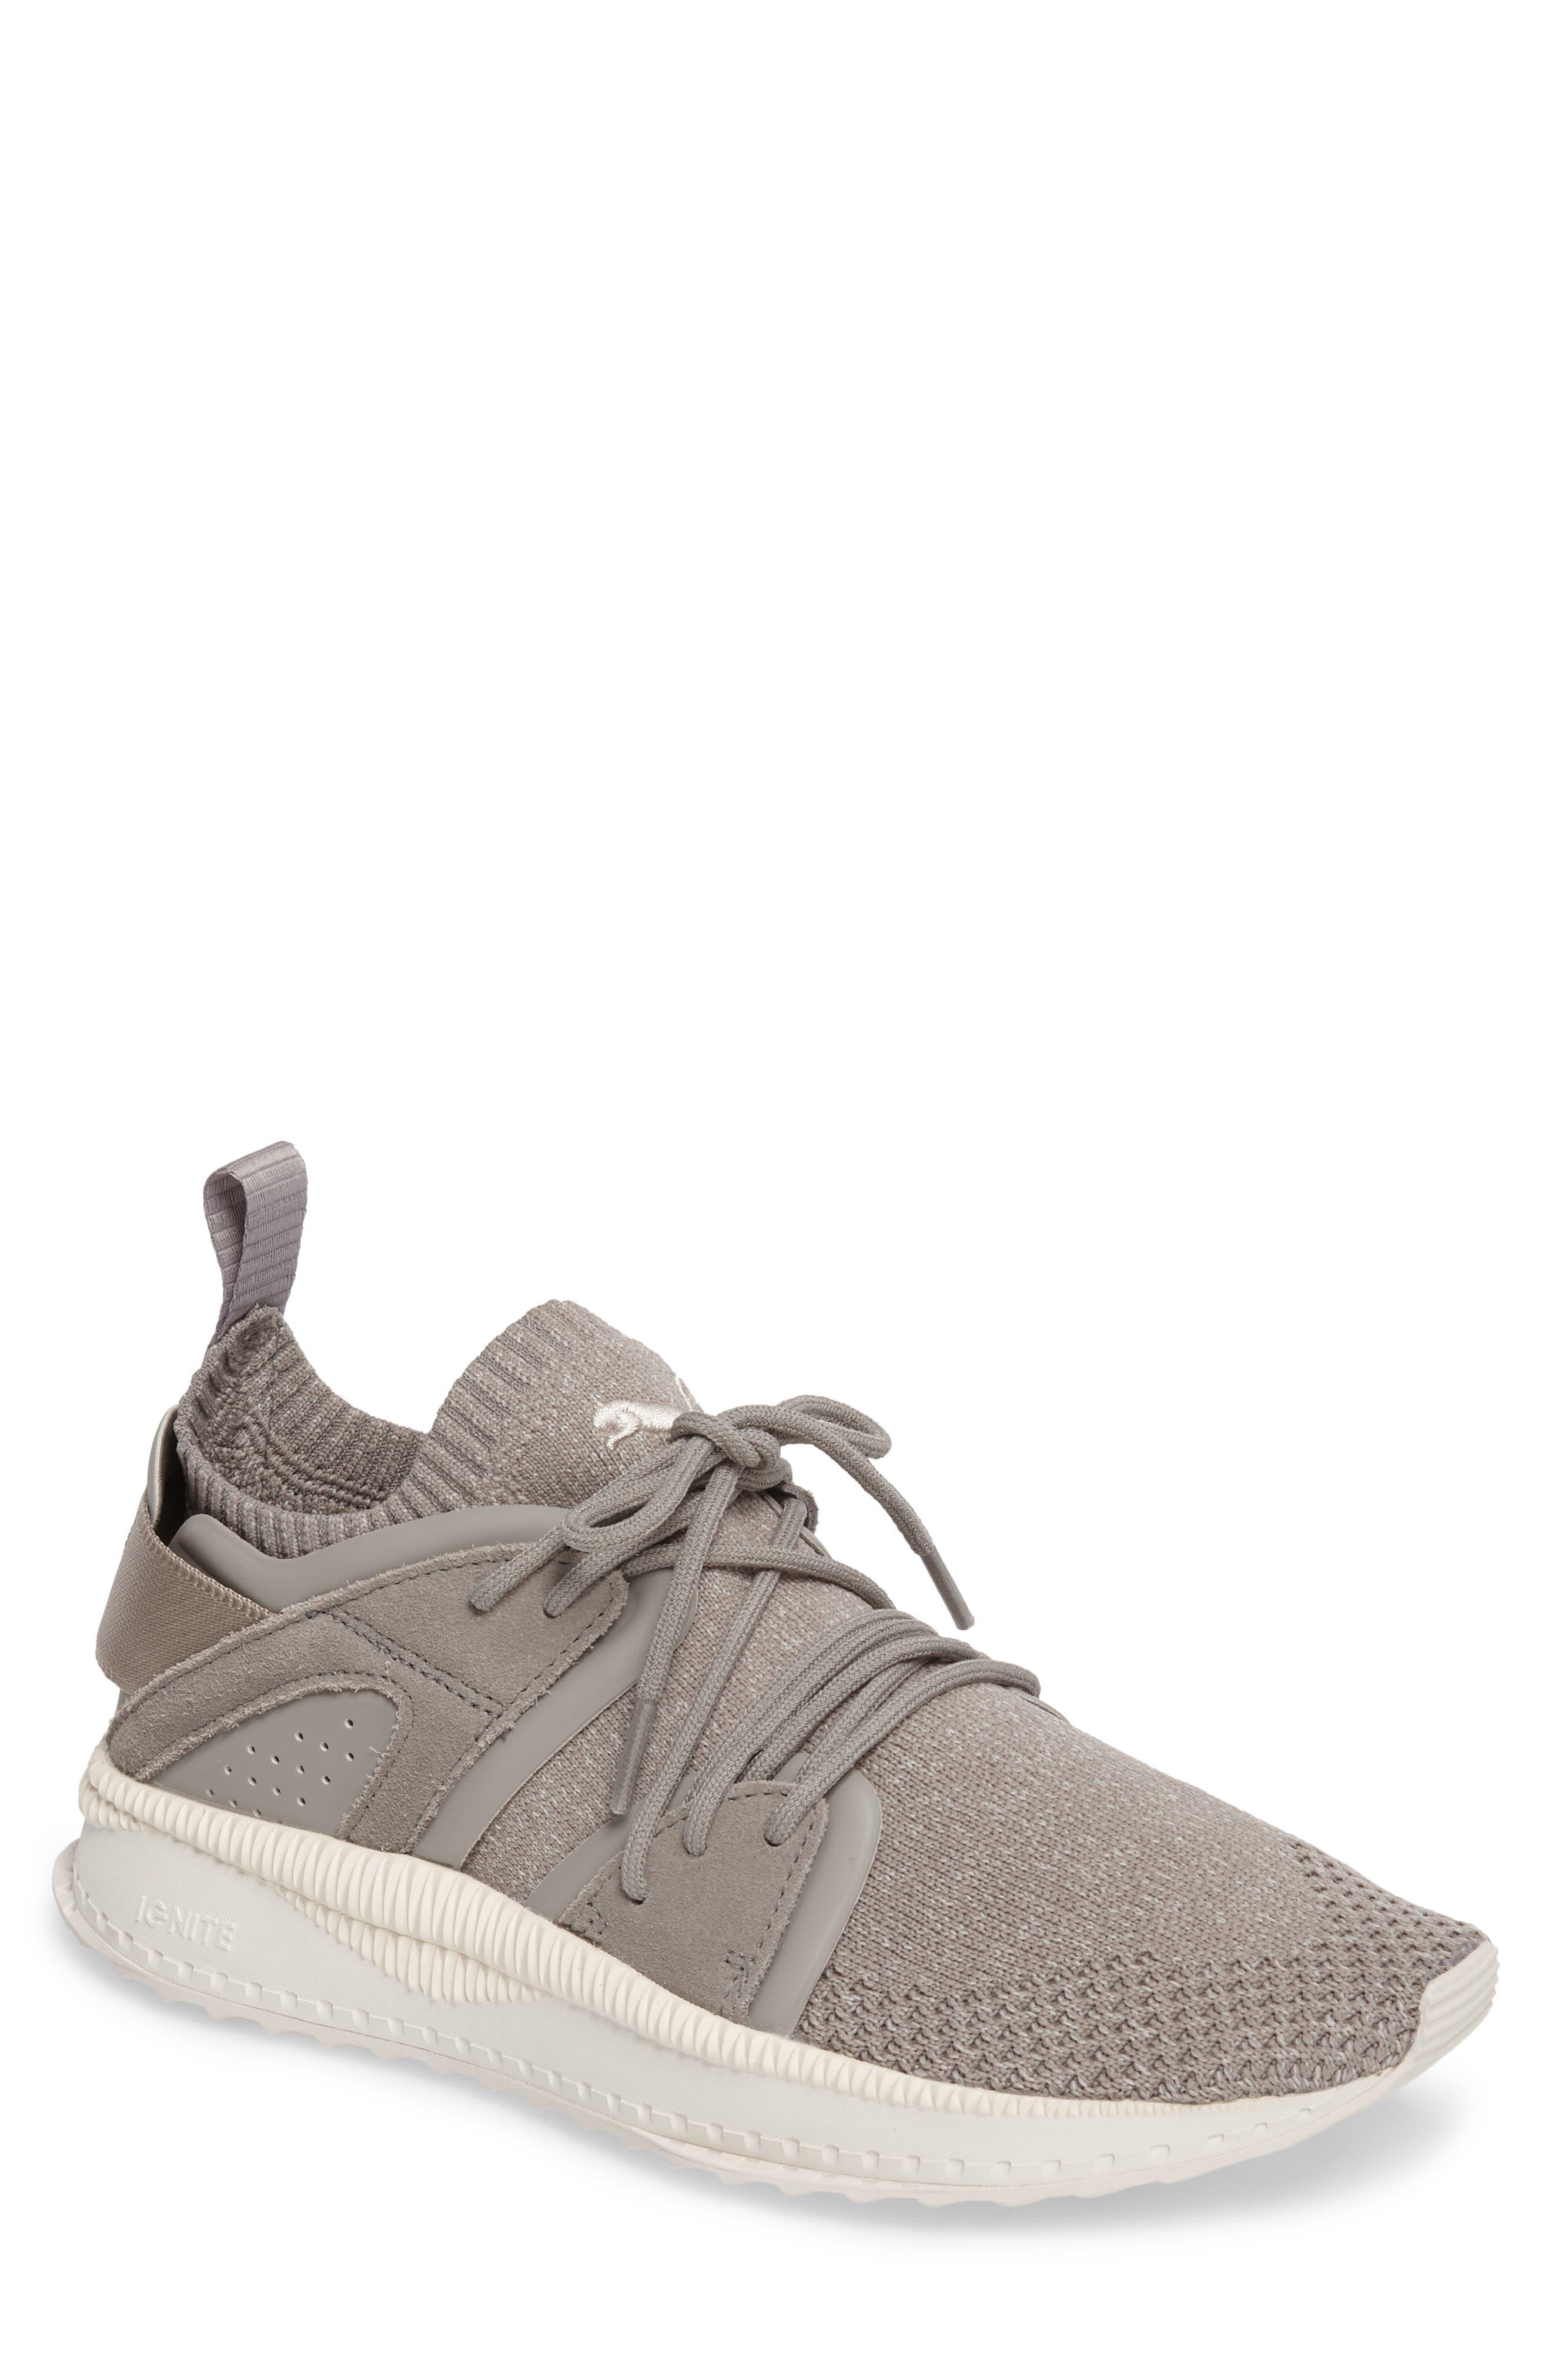 Tsug Blaze Evoknit Sneaker,                         Main,                         color, 253